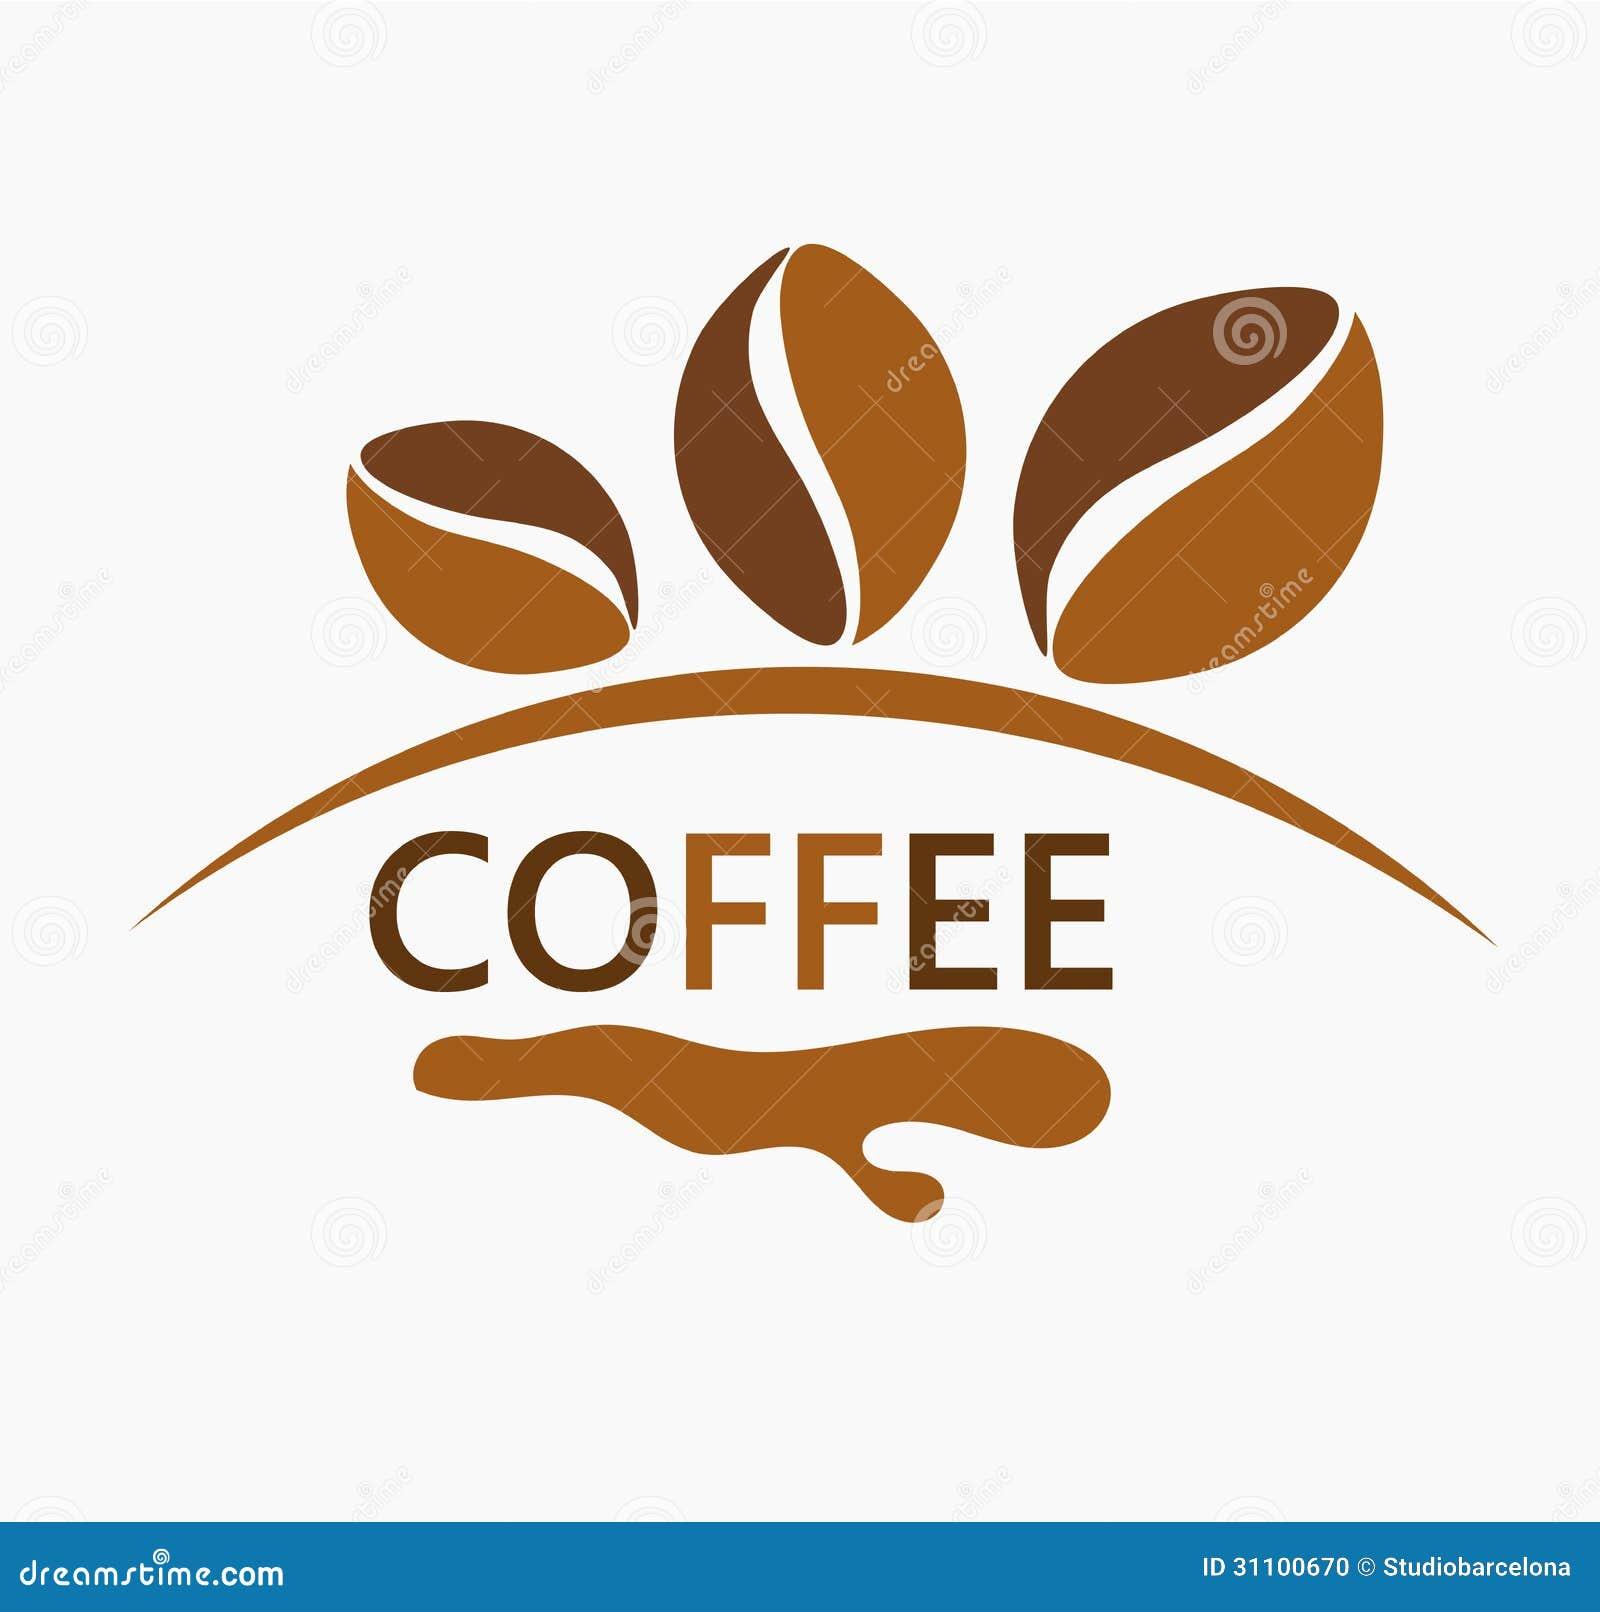 Coffee Beans Stock Photo - Image: 31100670